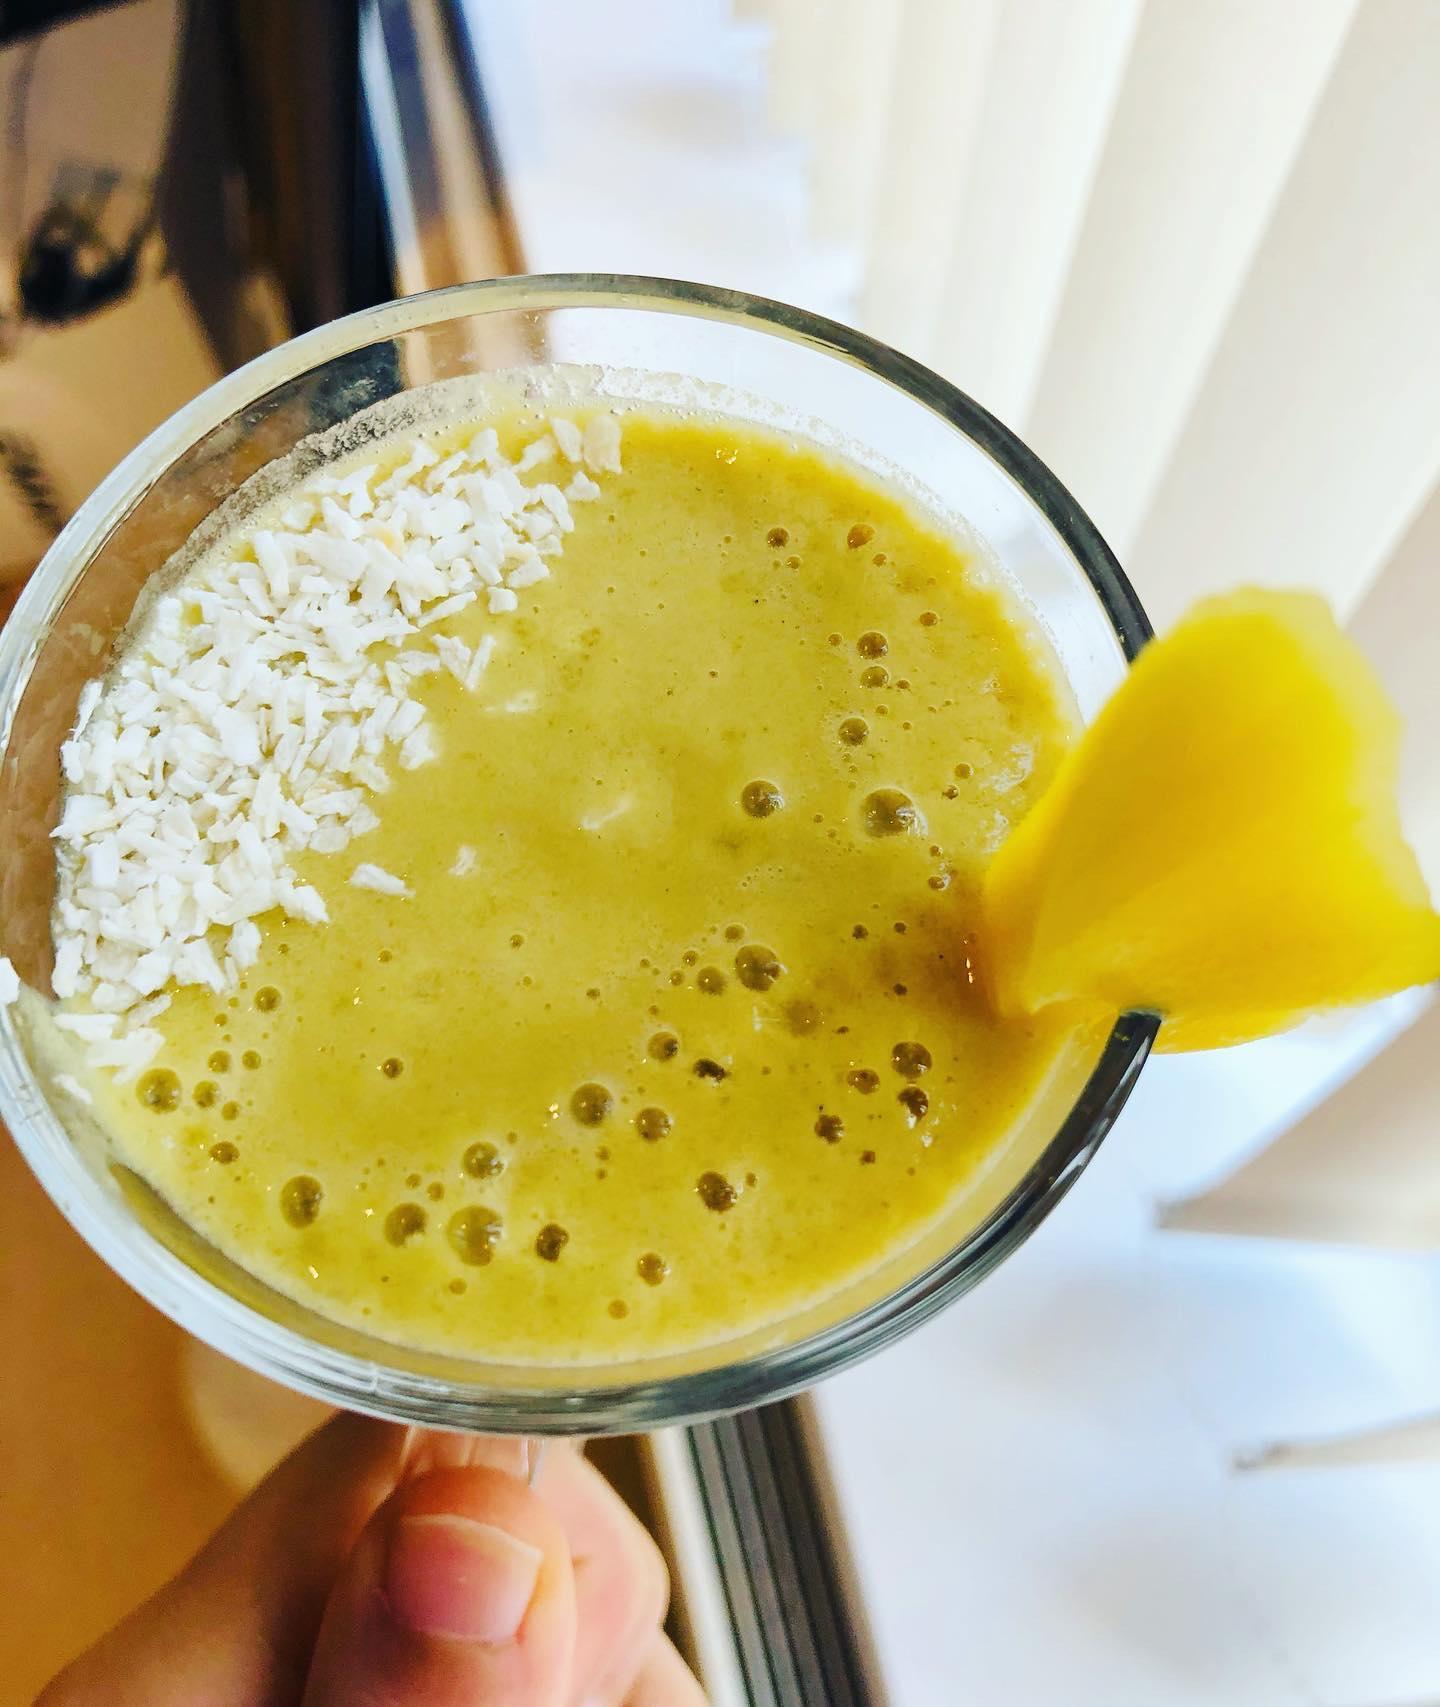 3-Ingredient 200 Calorie Protein Mango Smoothie